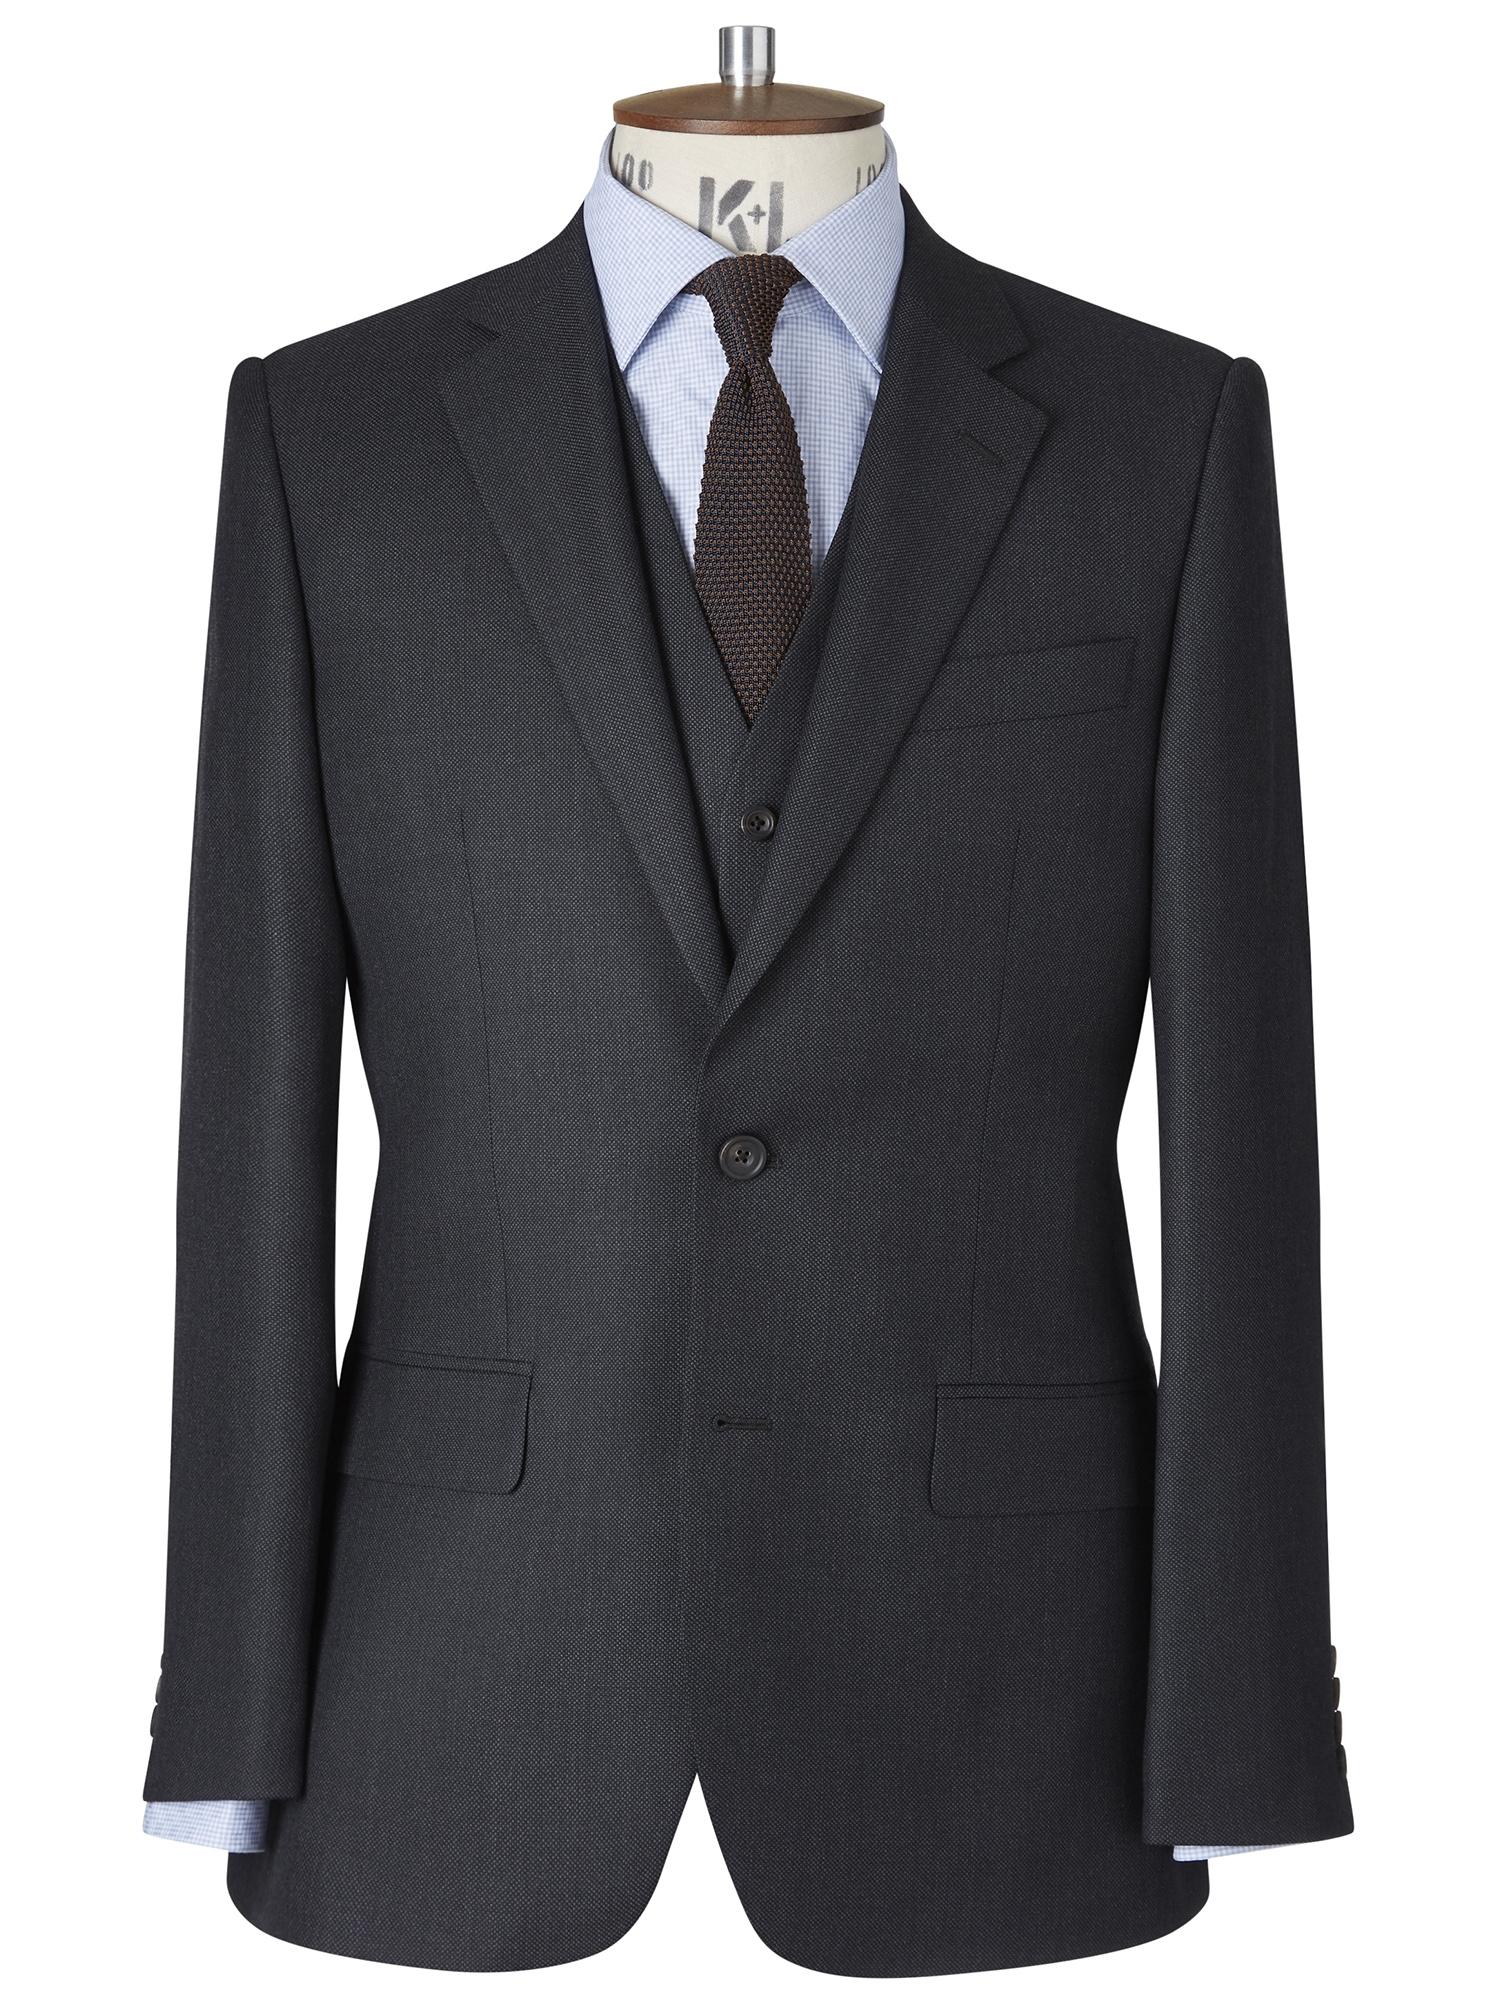 CHESTER BARRIE Classic Birdseye Berkeley Suit Jacket